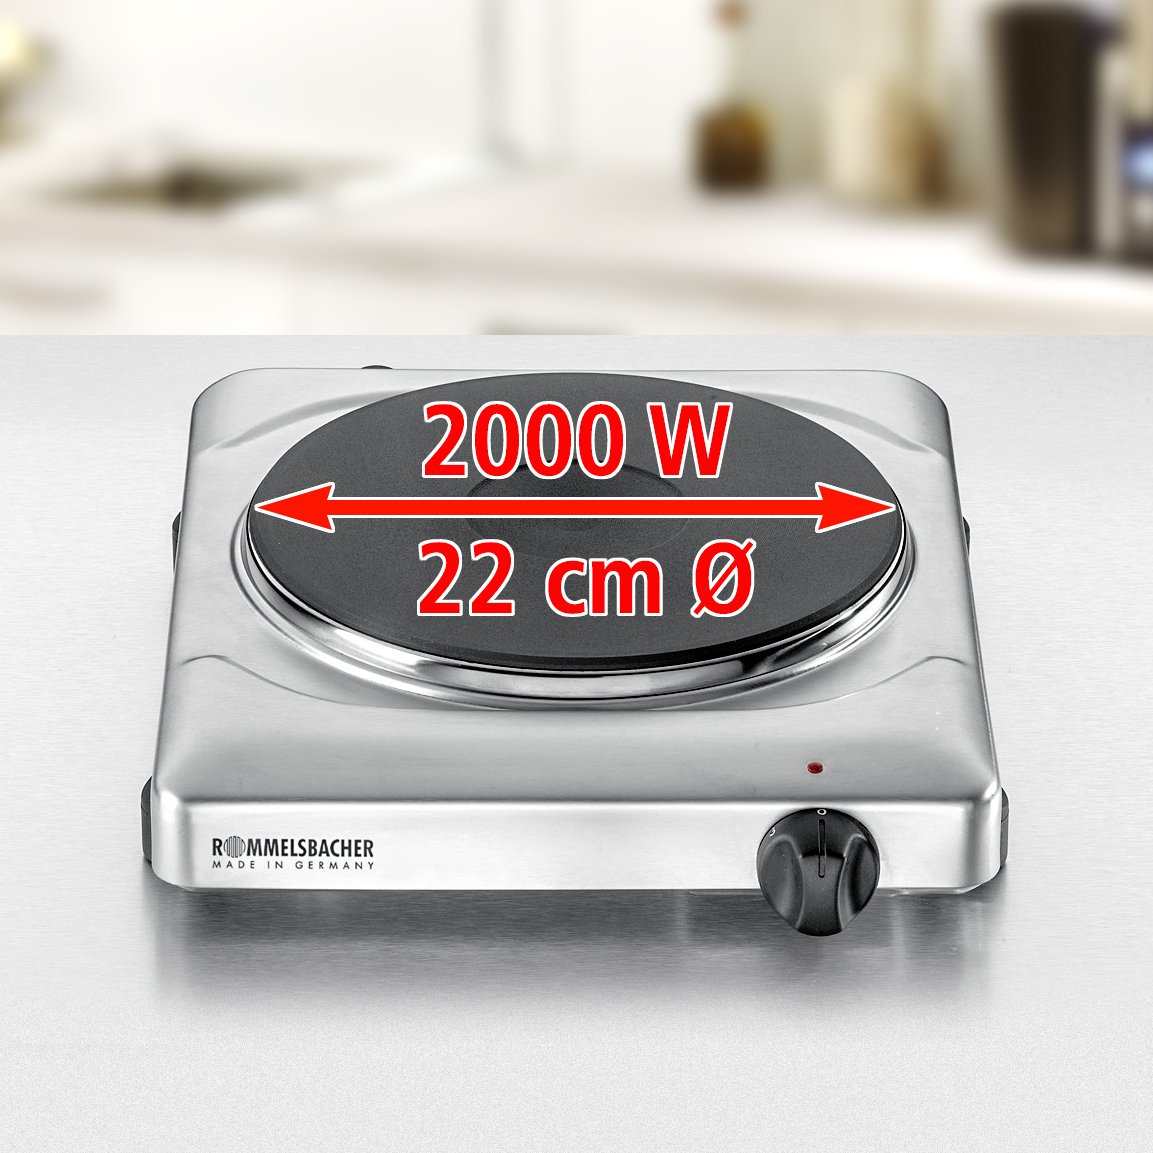 Rommelsbacher THS 2022/E Gastro - Cocina eléctrica portátil con un fuego (22 cm), acero: Amazon.es: Hogar